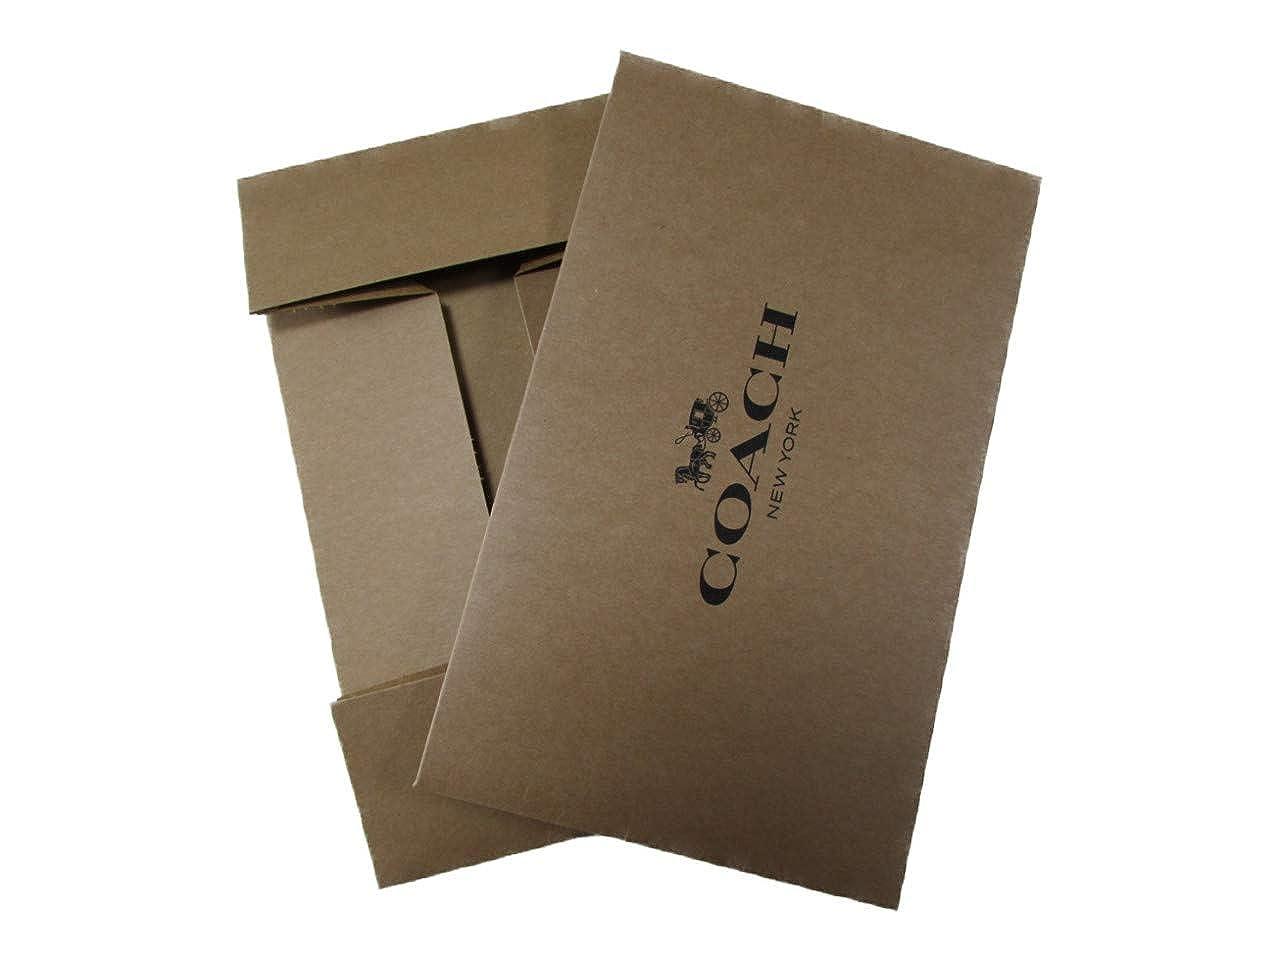 d51cb1c8196e Amazon | Coach コーチ プレゼントキット 茶袋 小 箱付き(財布・小物用) Coach Gift Kit 小 [並行輸入品] |  COACH(コーチ) | 財布